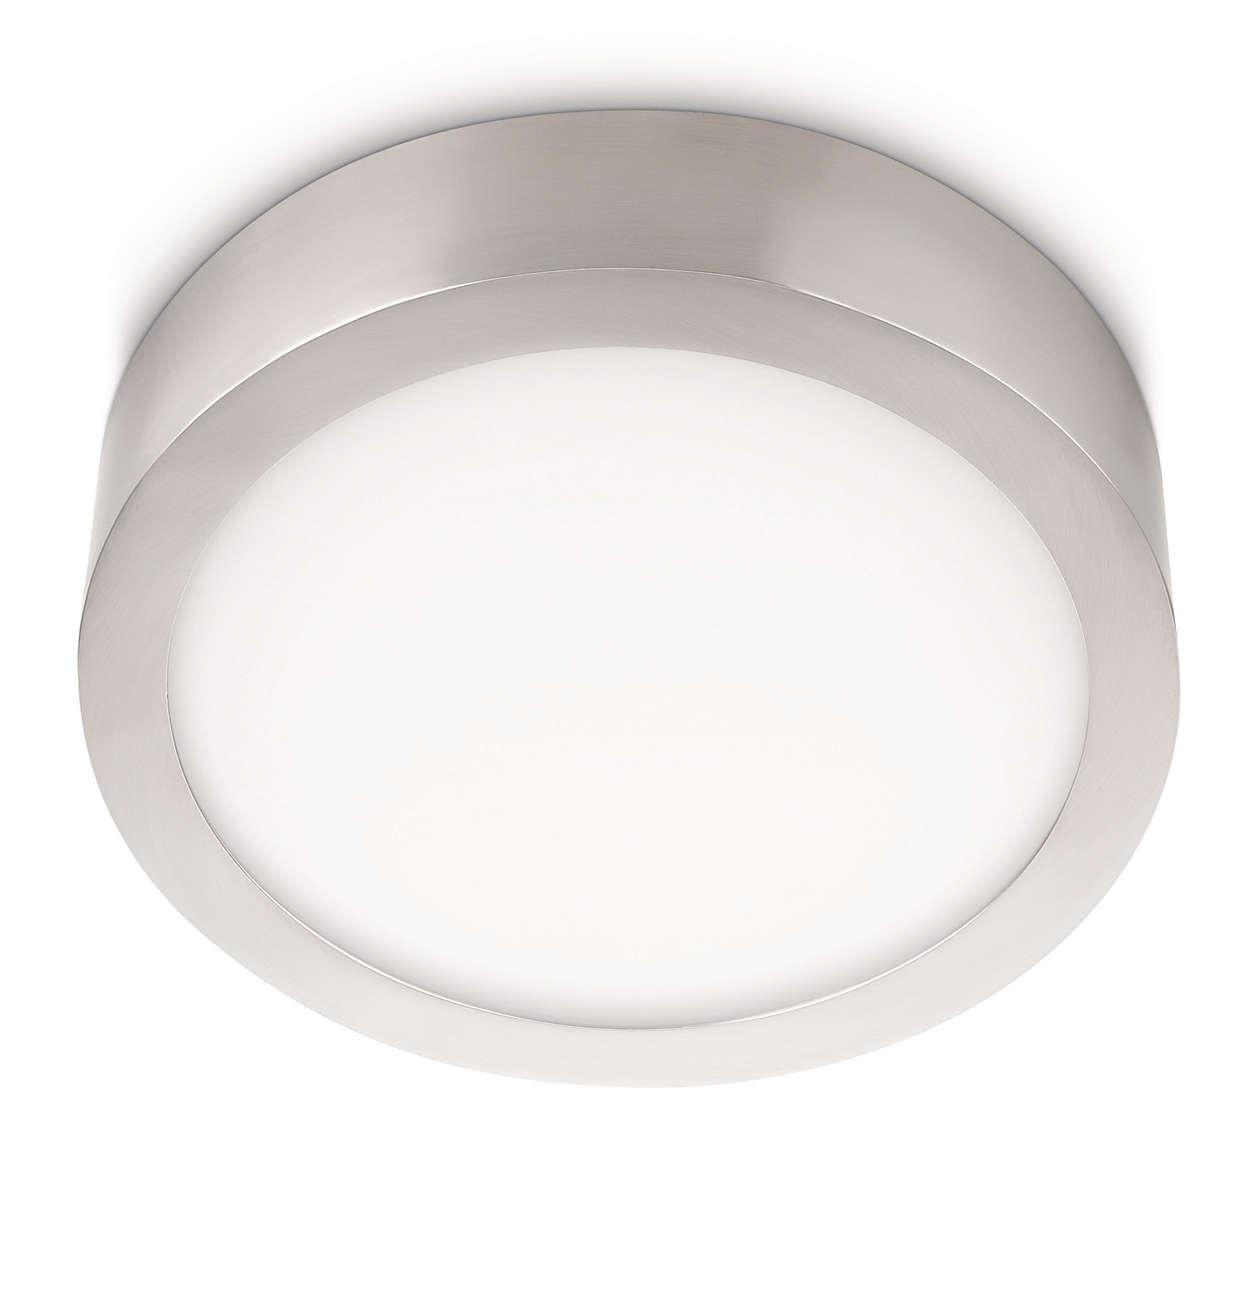 Arreda la tua casa con la luce